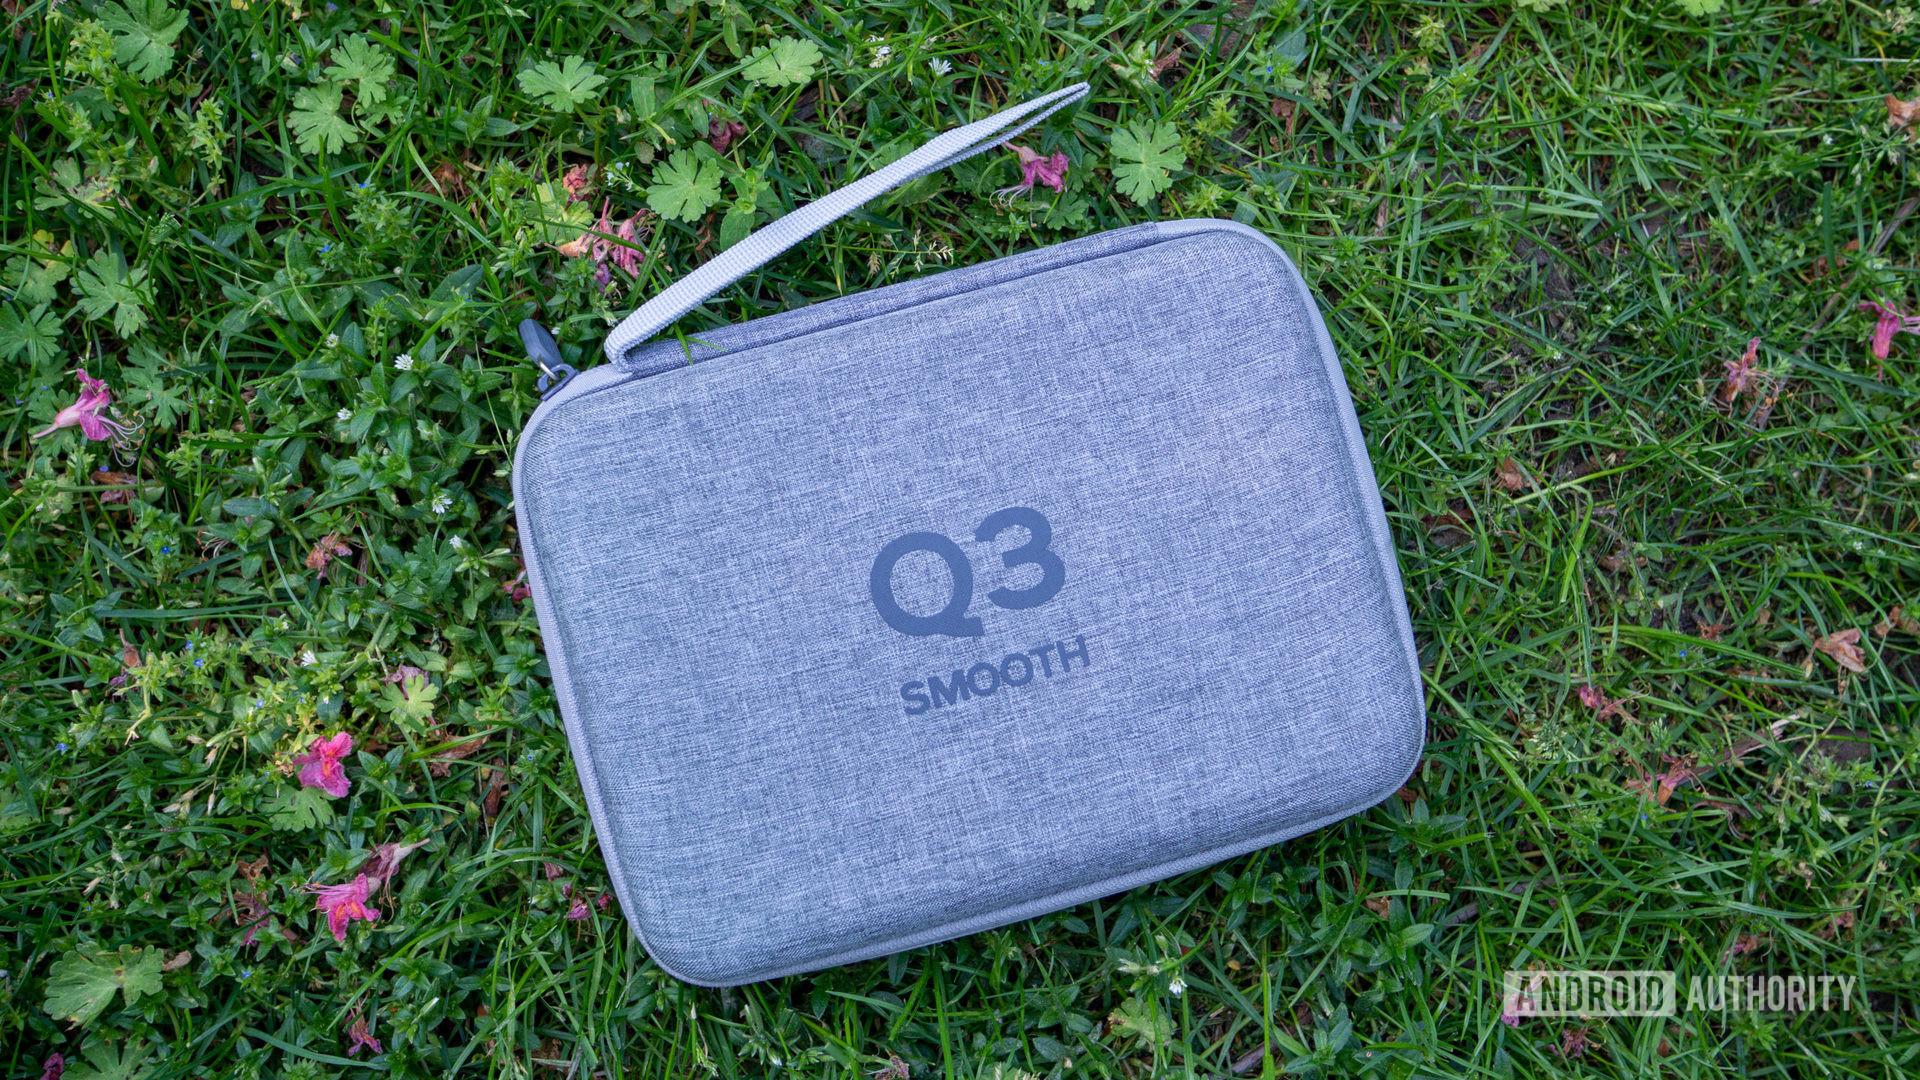 The Zhiyun Smooth-Q3 carry case